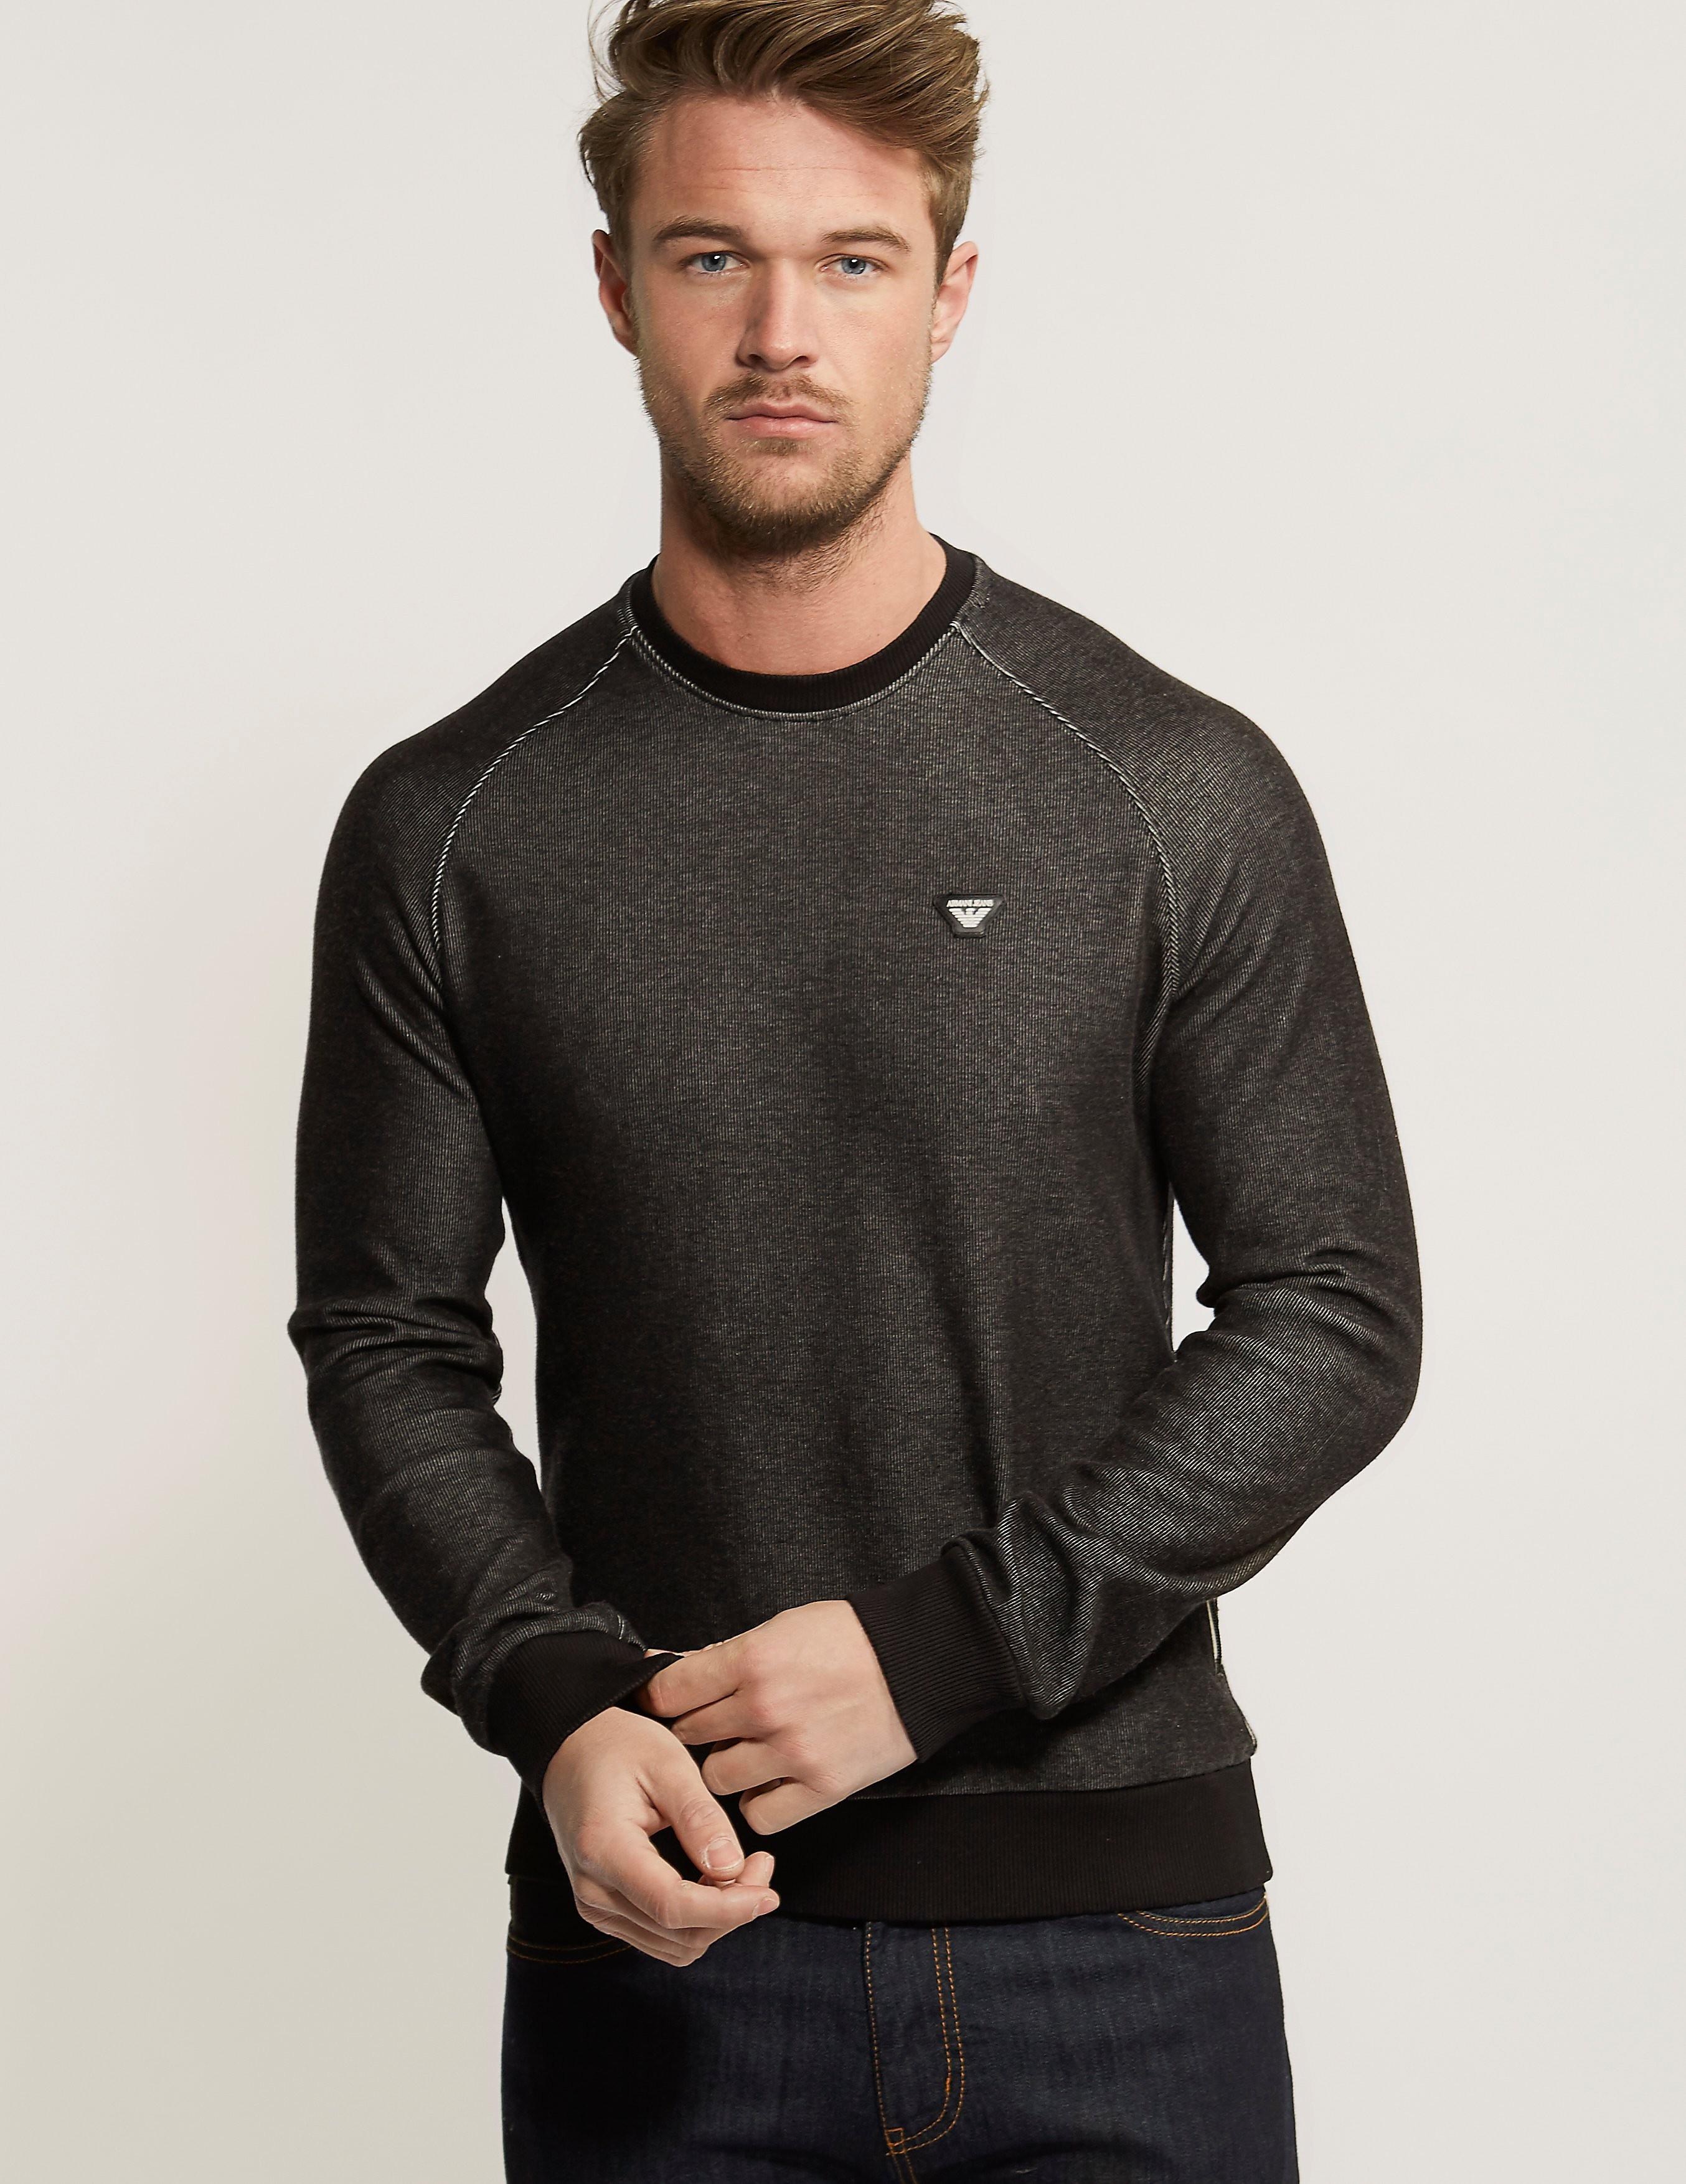 Armani Jeans Crew Neck Twill Long Sleeve Sweatshirt